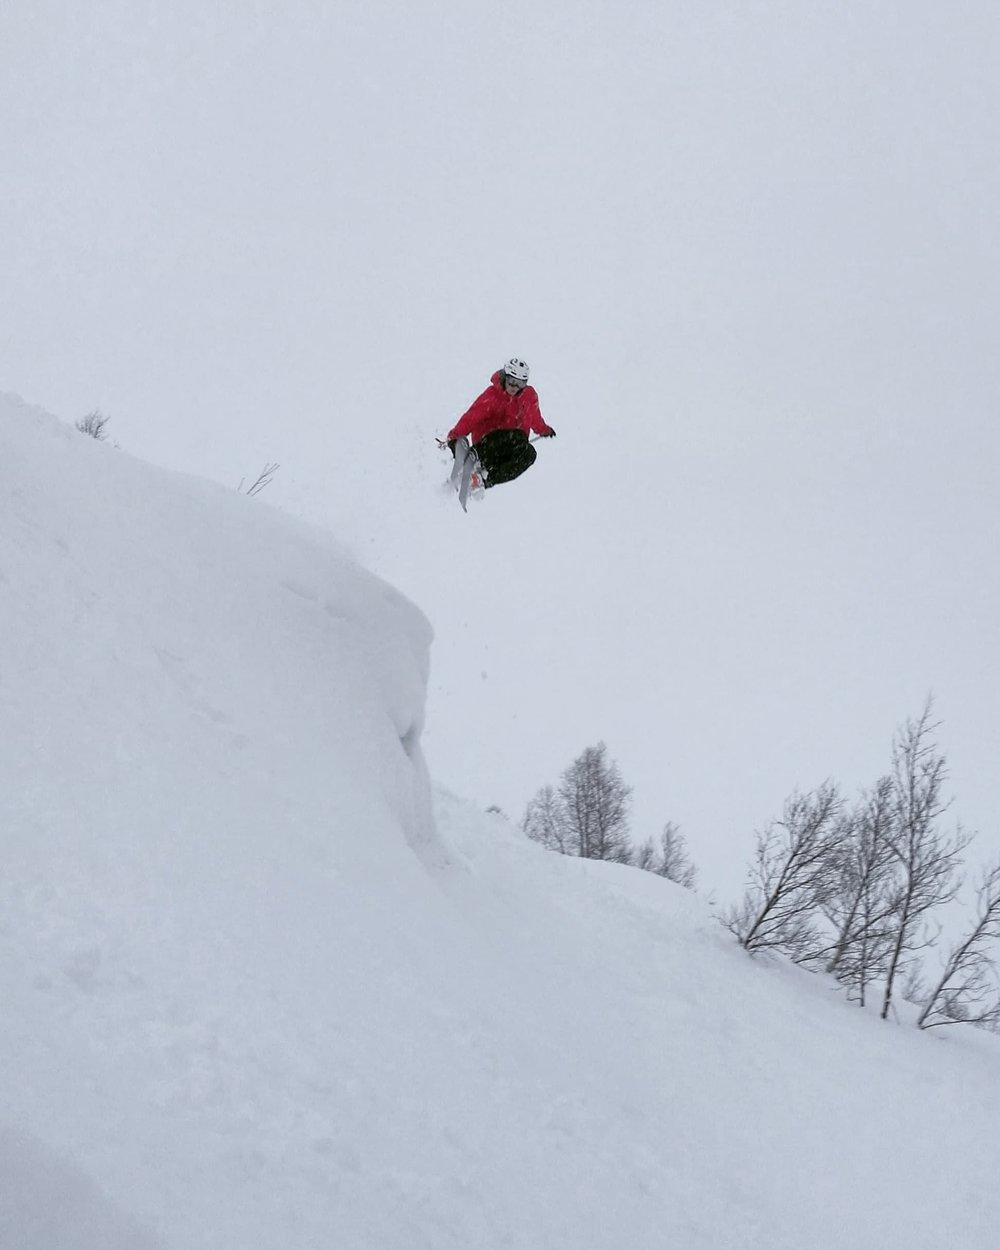 Foto: Vegard Åsen